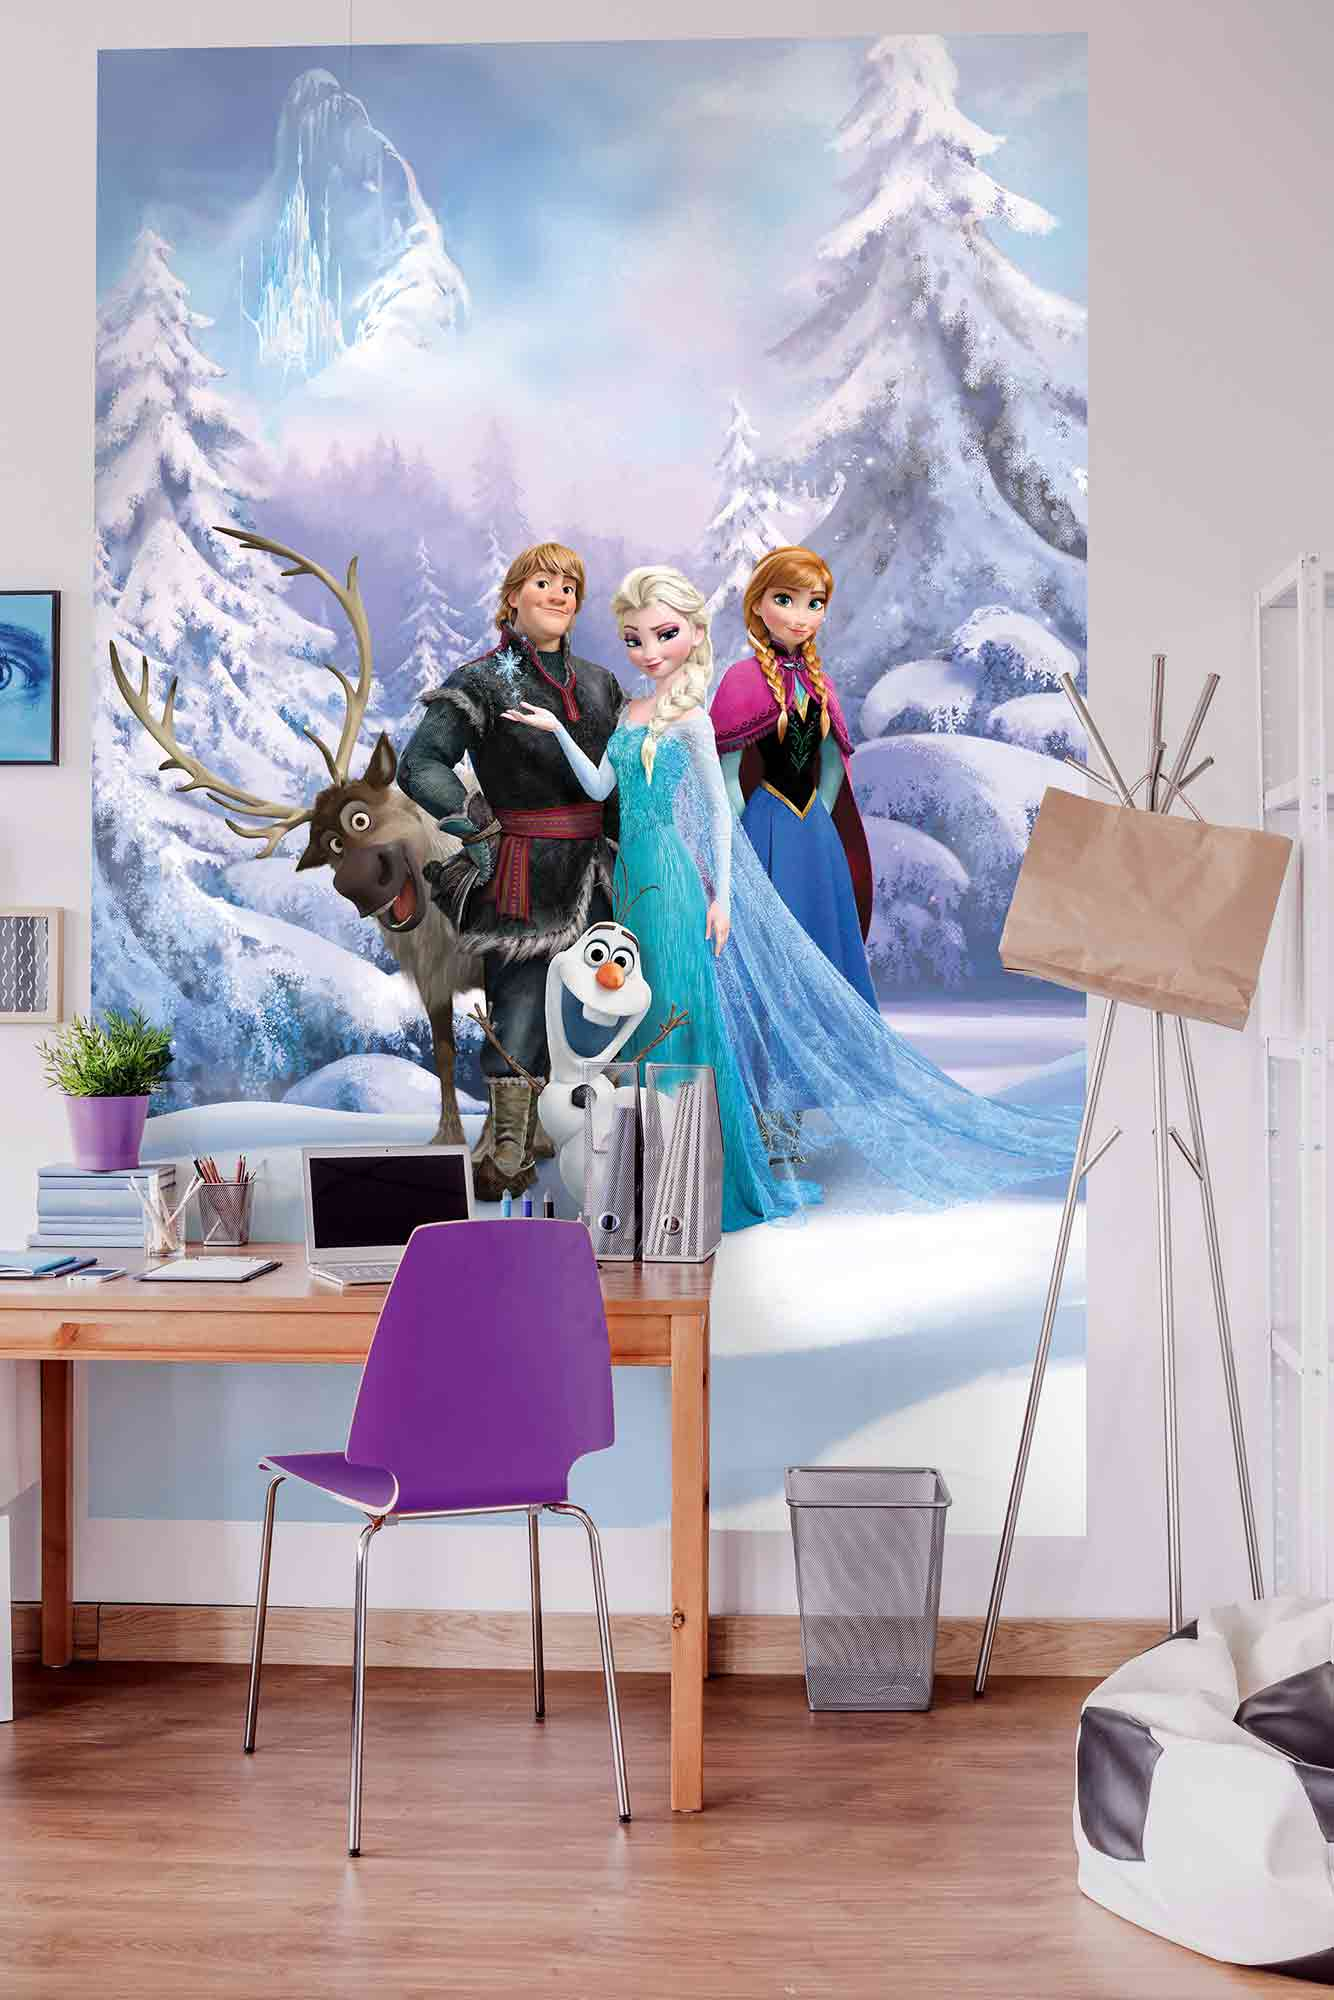 Full Size of Tapeten Kinderzimmer Disney Elsa Frozen Forest Winter Land Fototapete Kindertapeten Regal Weiß Wohnzimmer Ideen Fototapeten Sofa Für Die Küche Regale Kinderzimmer Tapeten Kinderzimmer